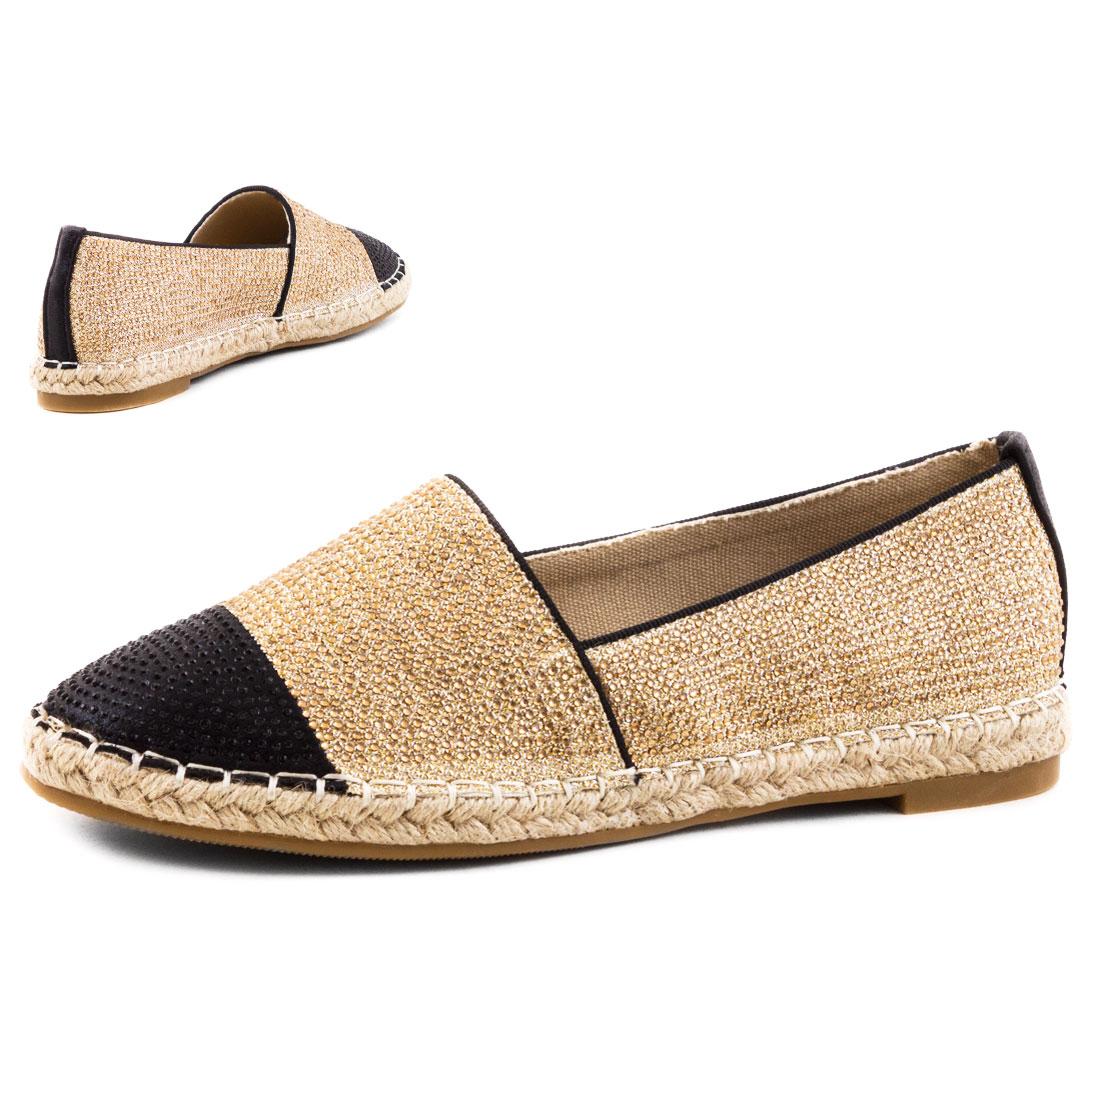 neu damen sommer espadrilles sneaker slipper bast strass gr 36 37 38 39 40 41 ebay. Black Bedroom Furniture Sets. Home Design Ideas